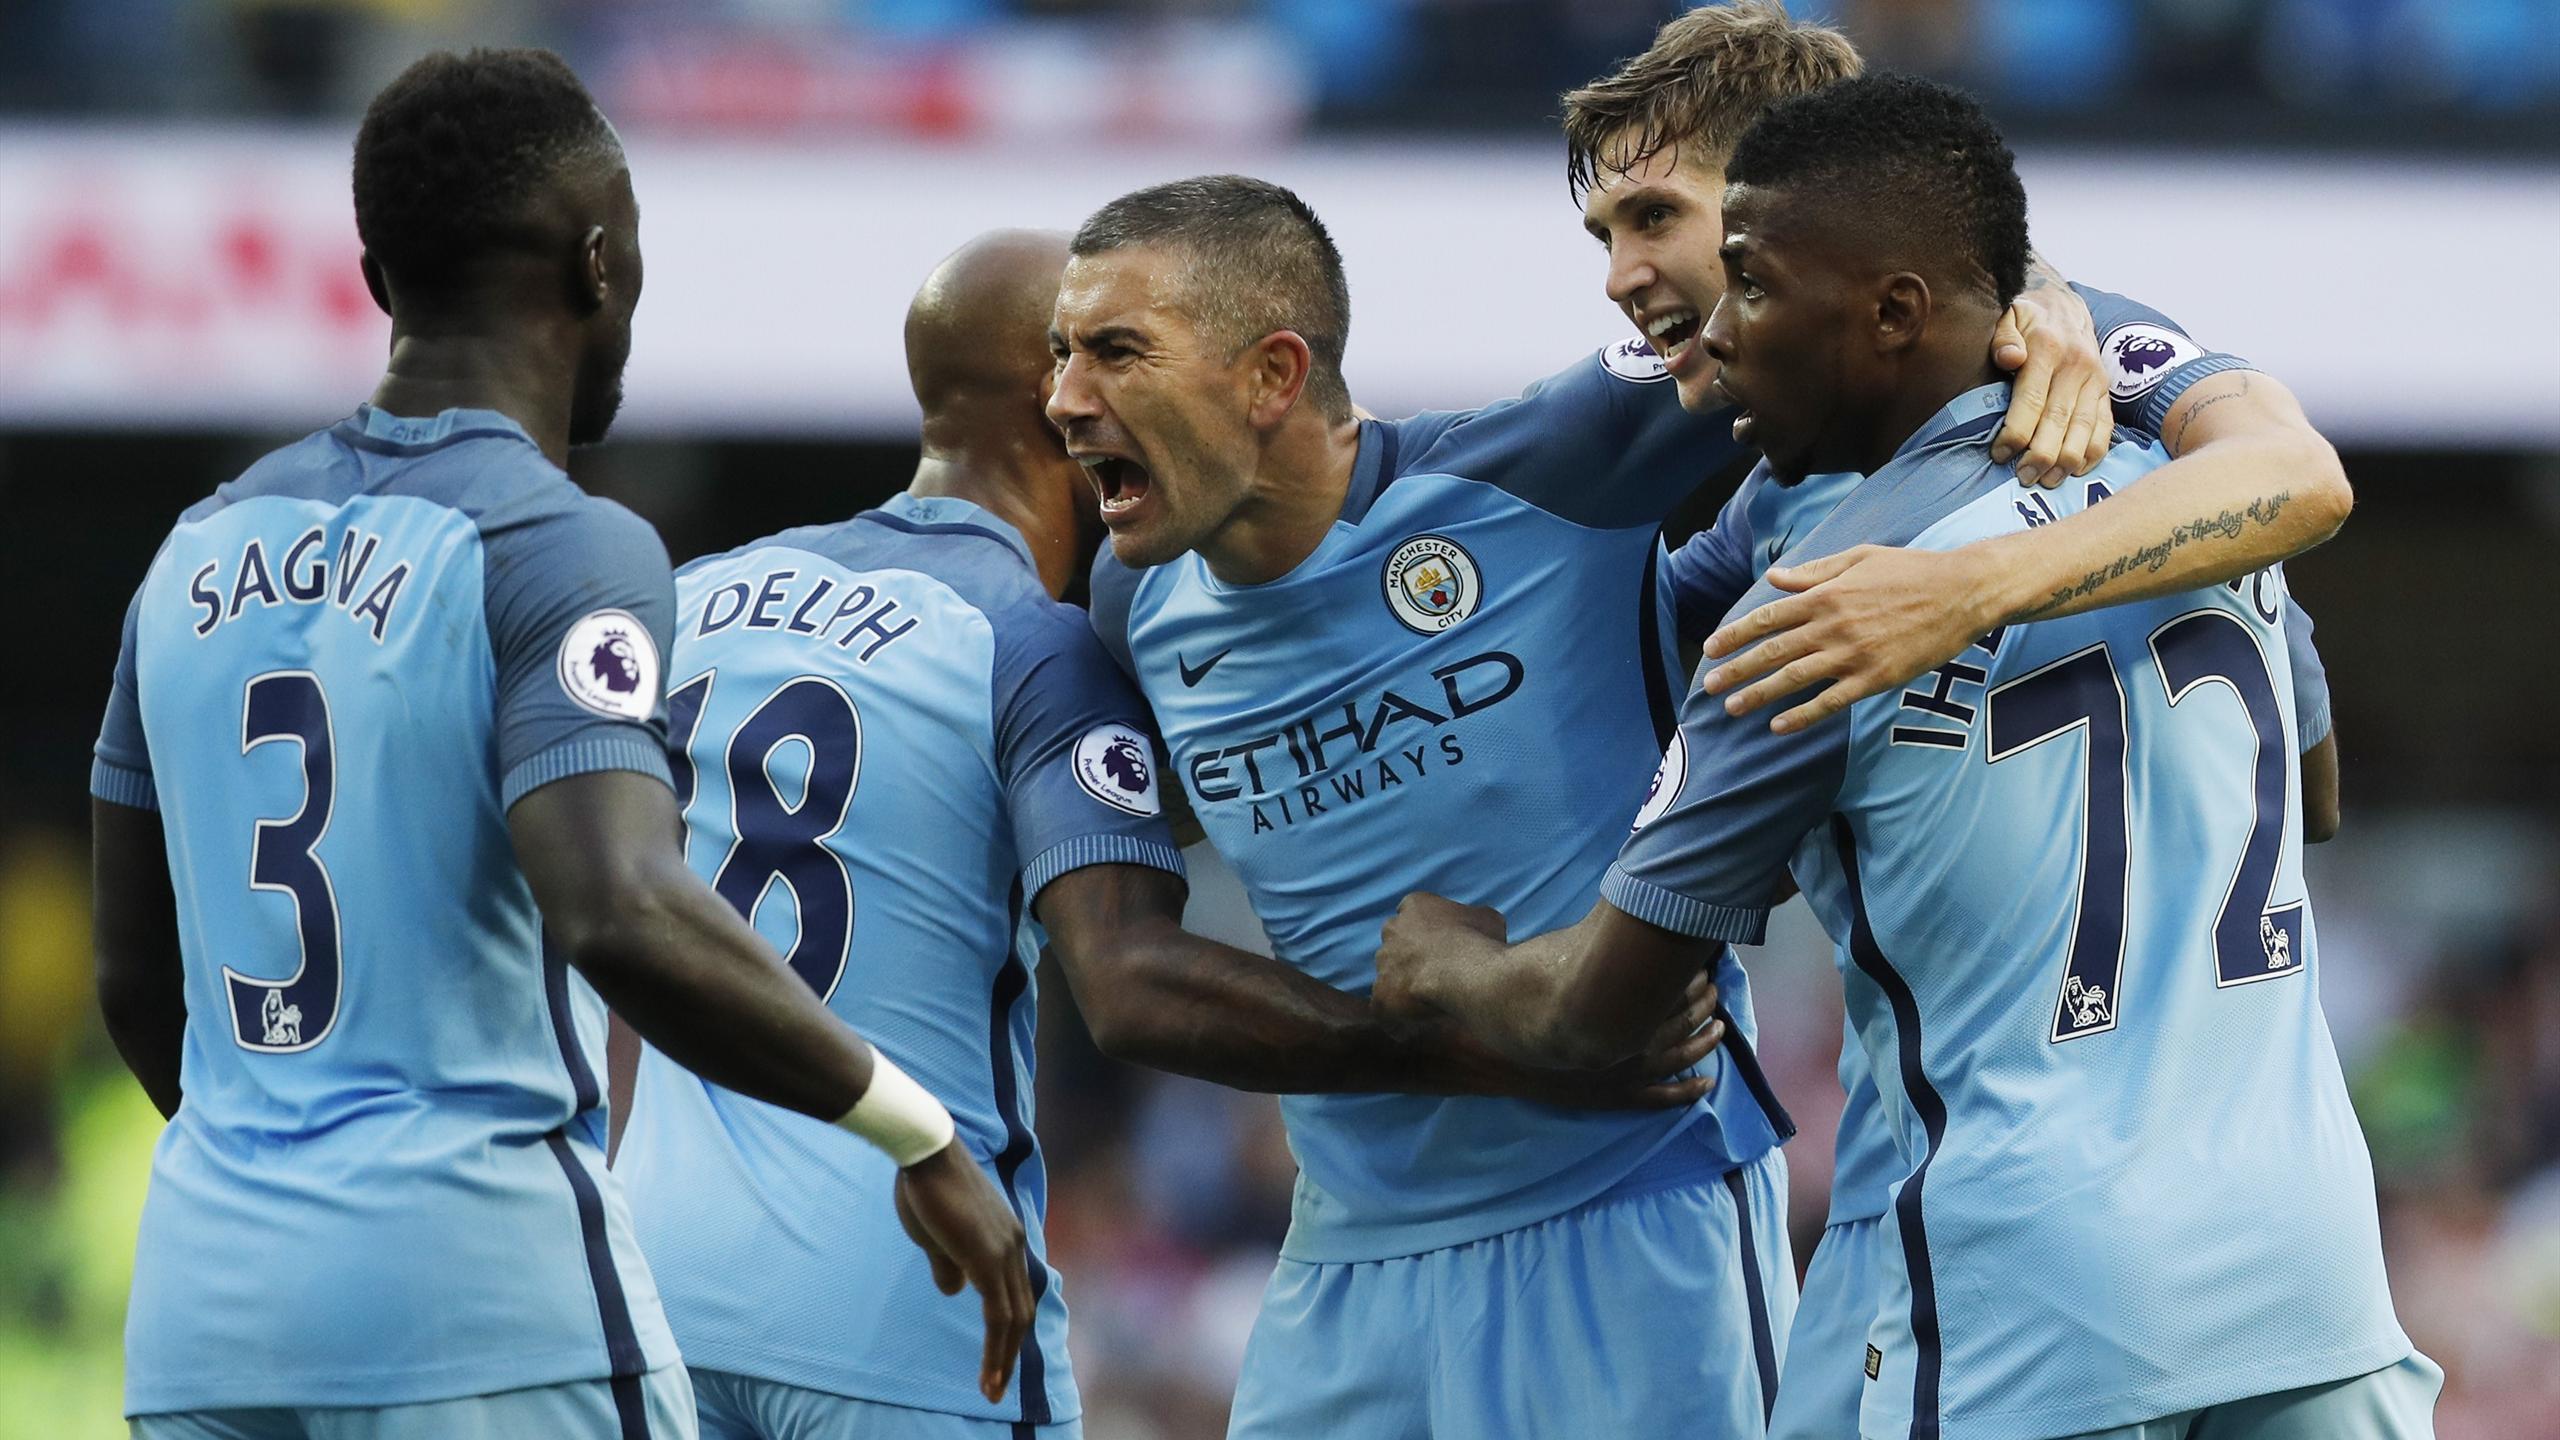 Manchester City's Aleksandar Kolarov celebrates Sunderland's Paddy McNair scoring a own goal and their second